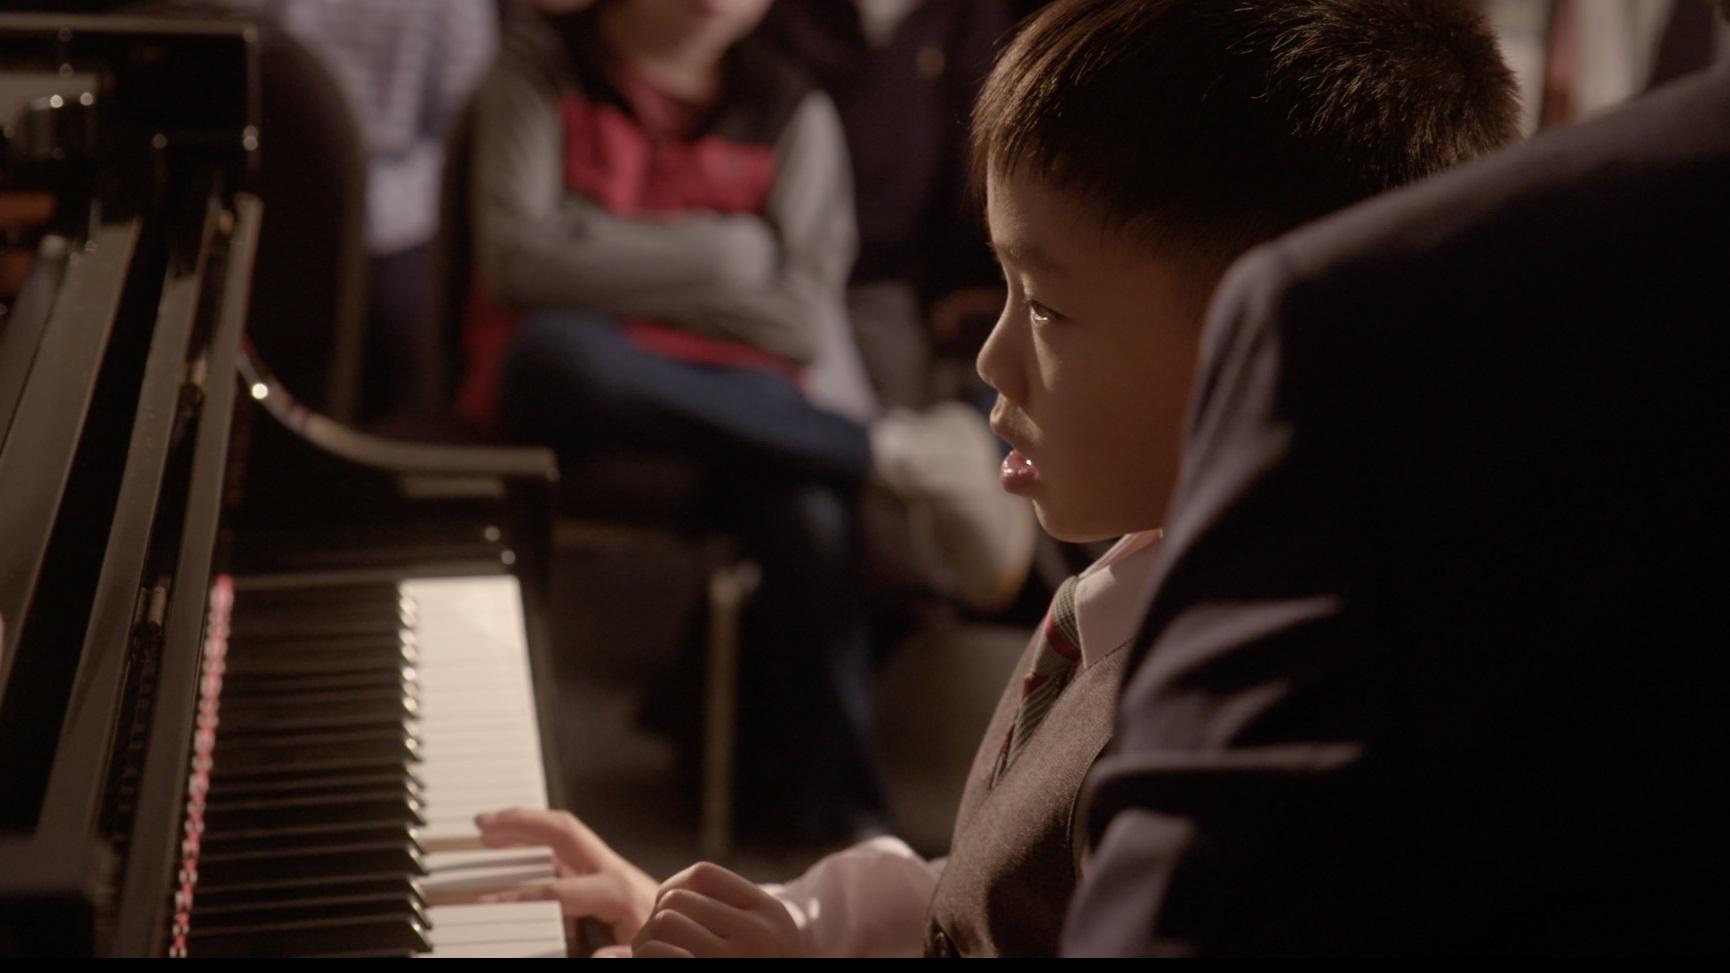 brandon+piano+recital.jpg